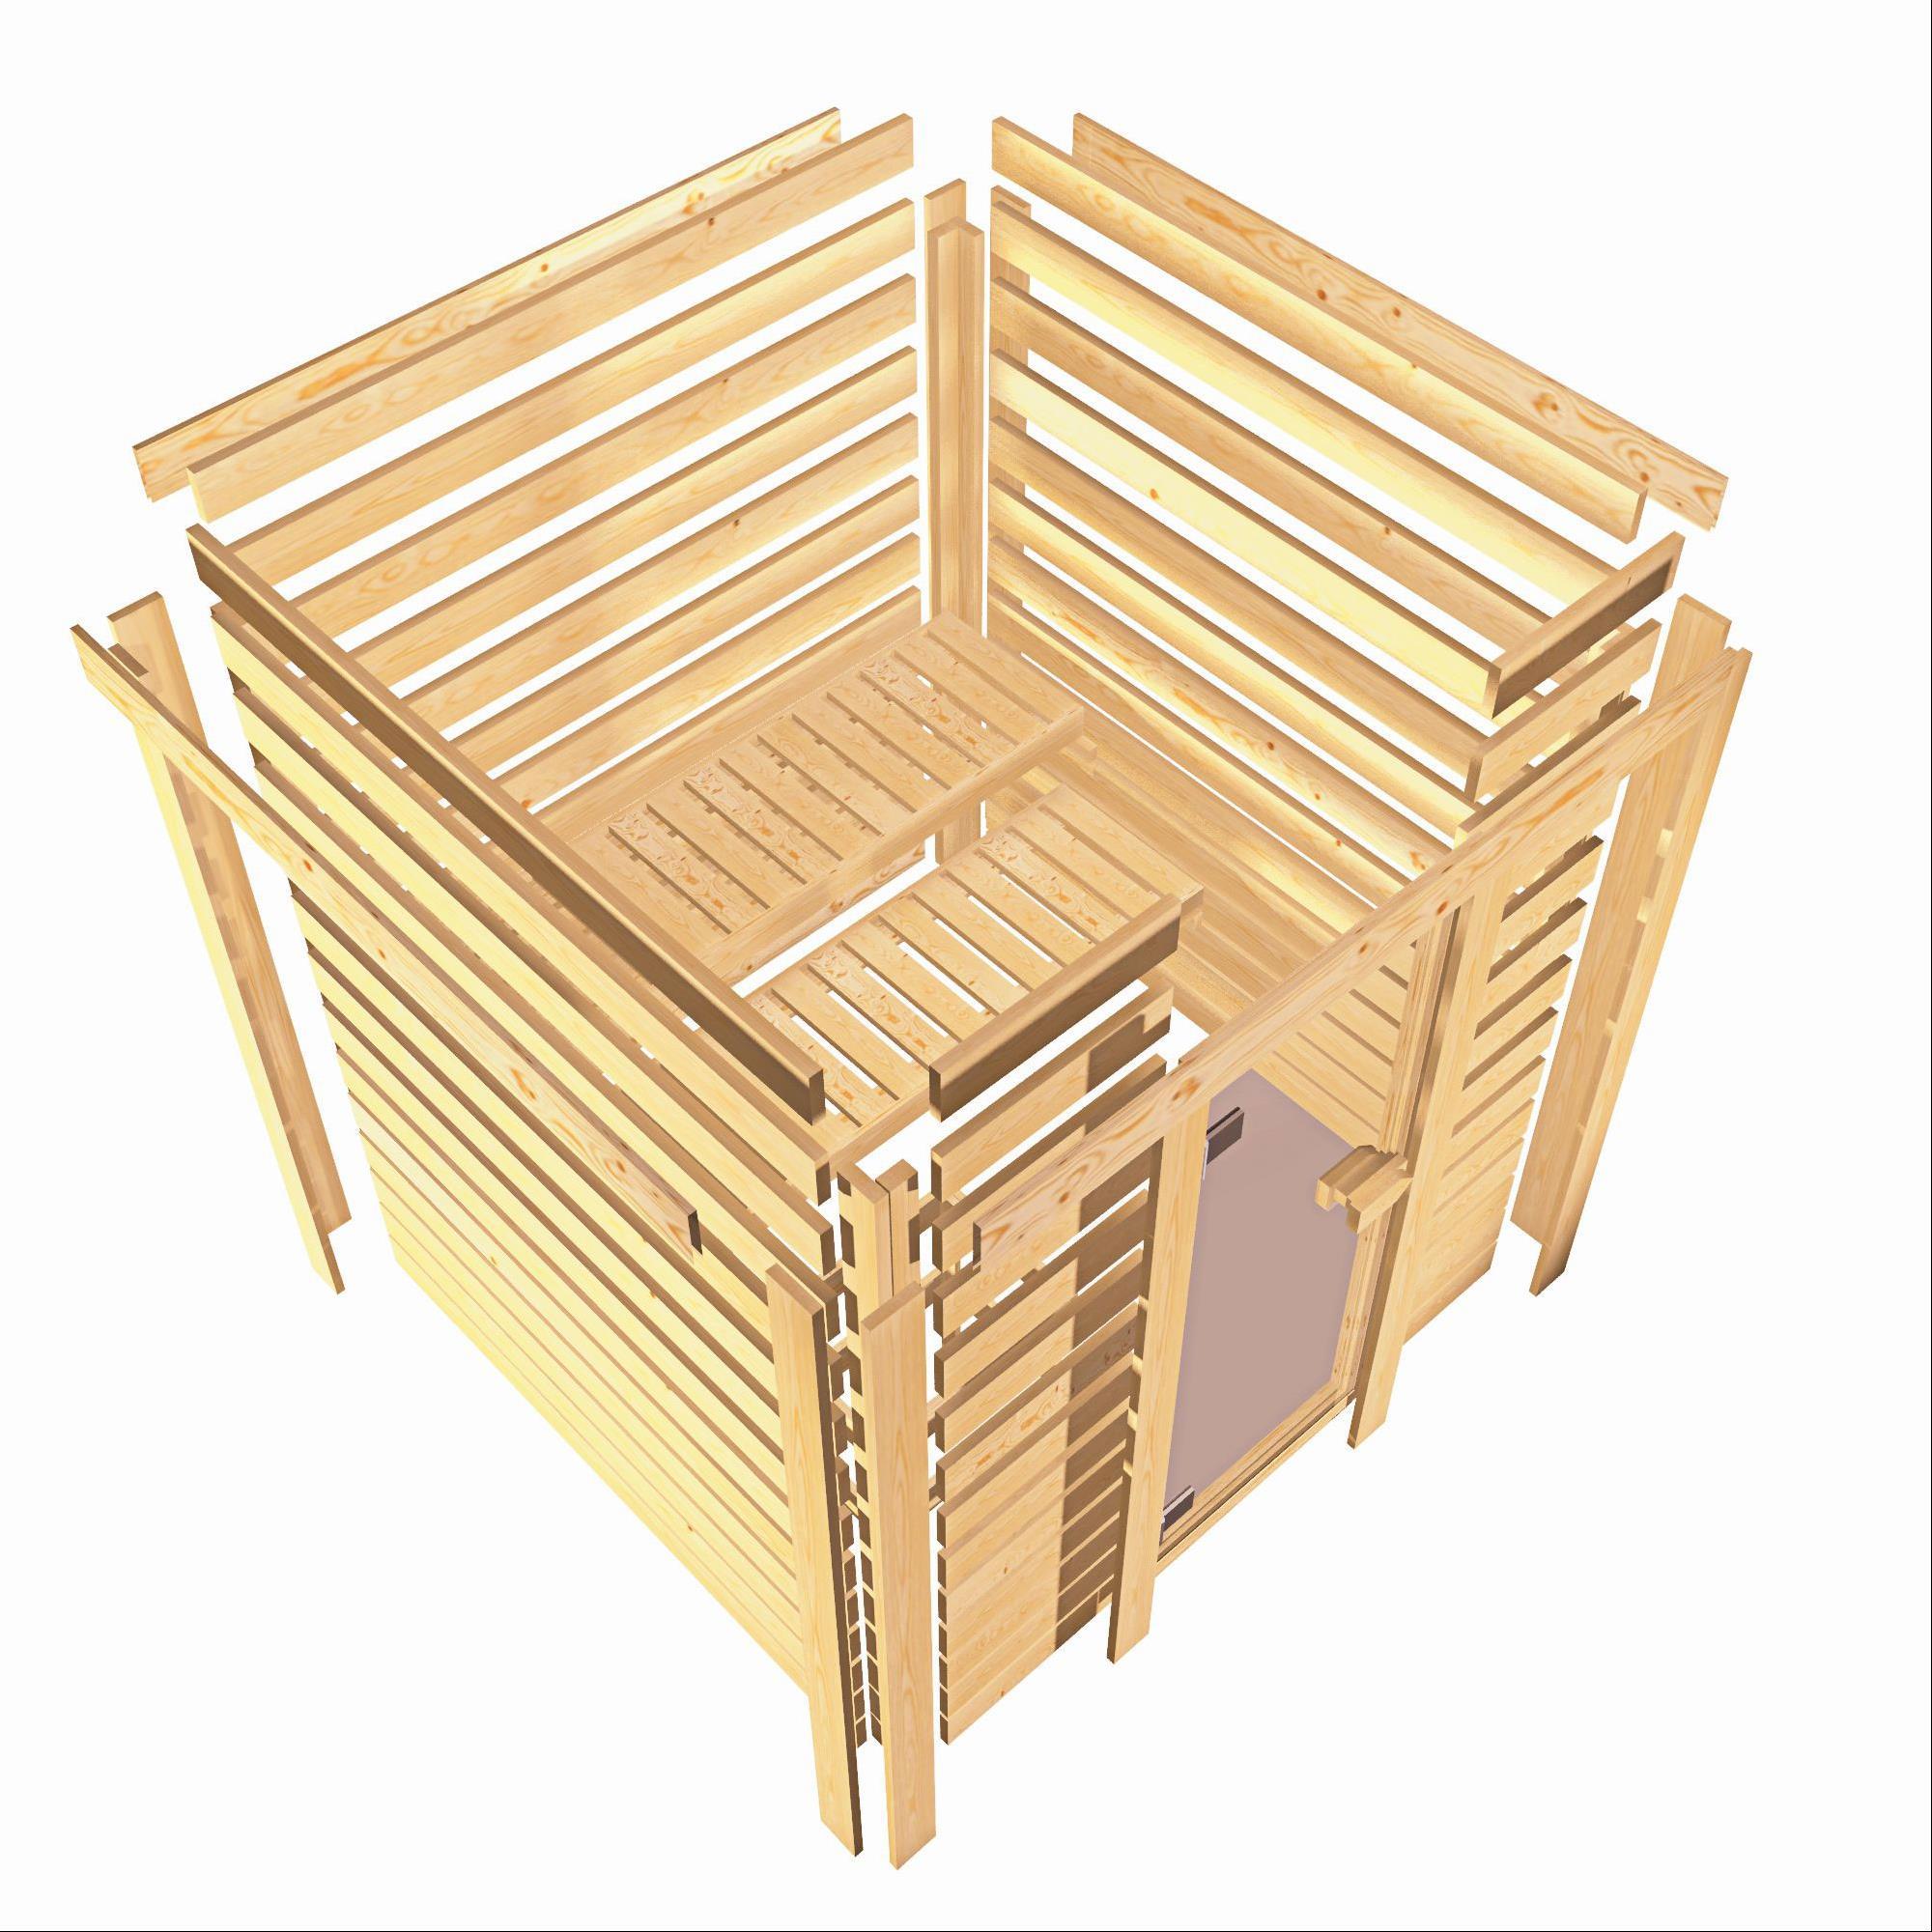 WoodFeeling Sauna Mia 38mm Bio Saunaofen 9kW extern Kranz Klarglas Tür Bild 4